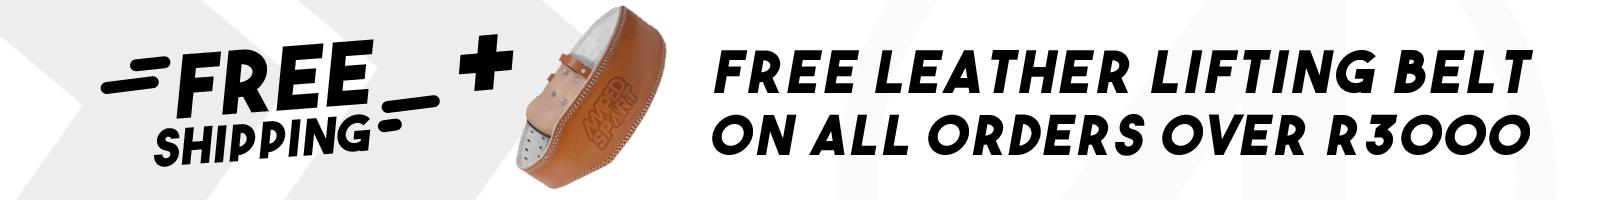 free shipping + belt